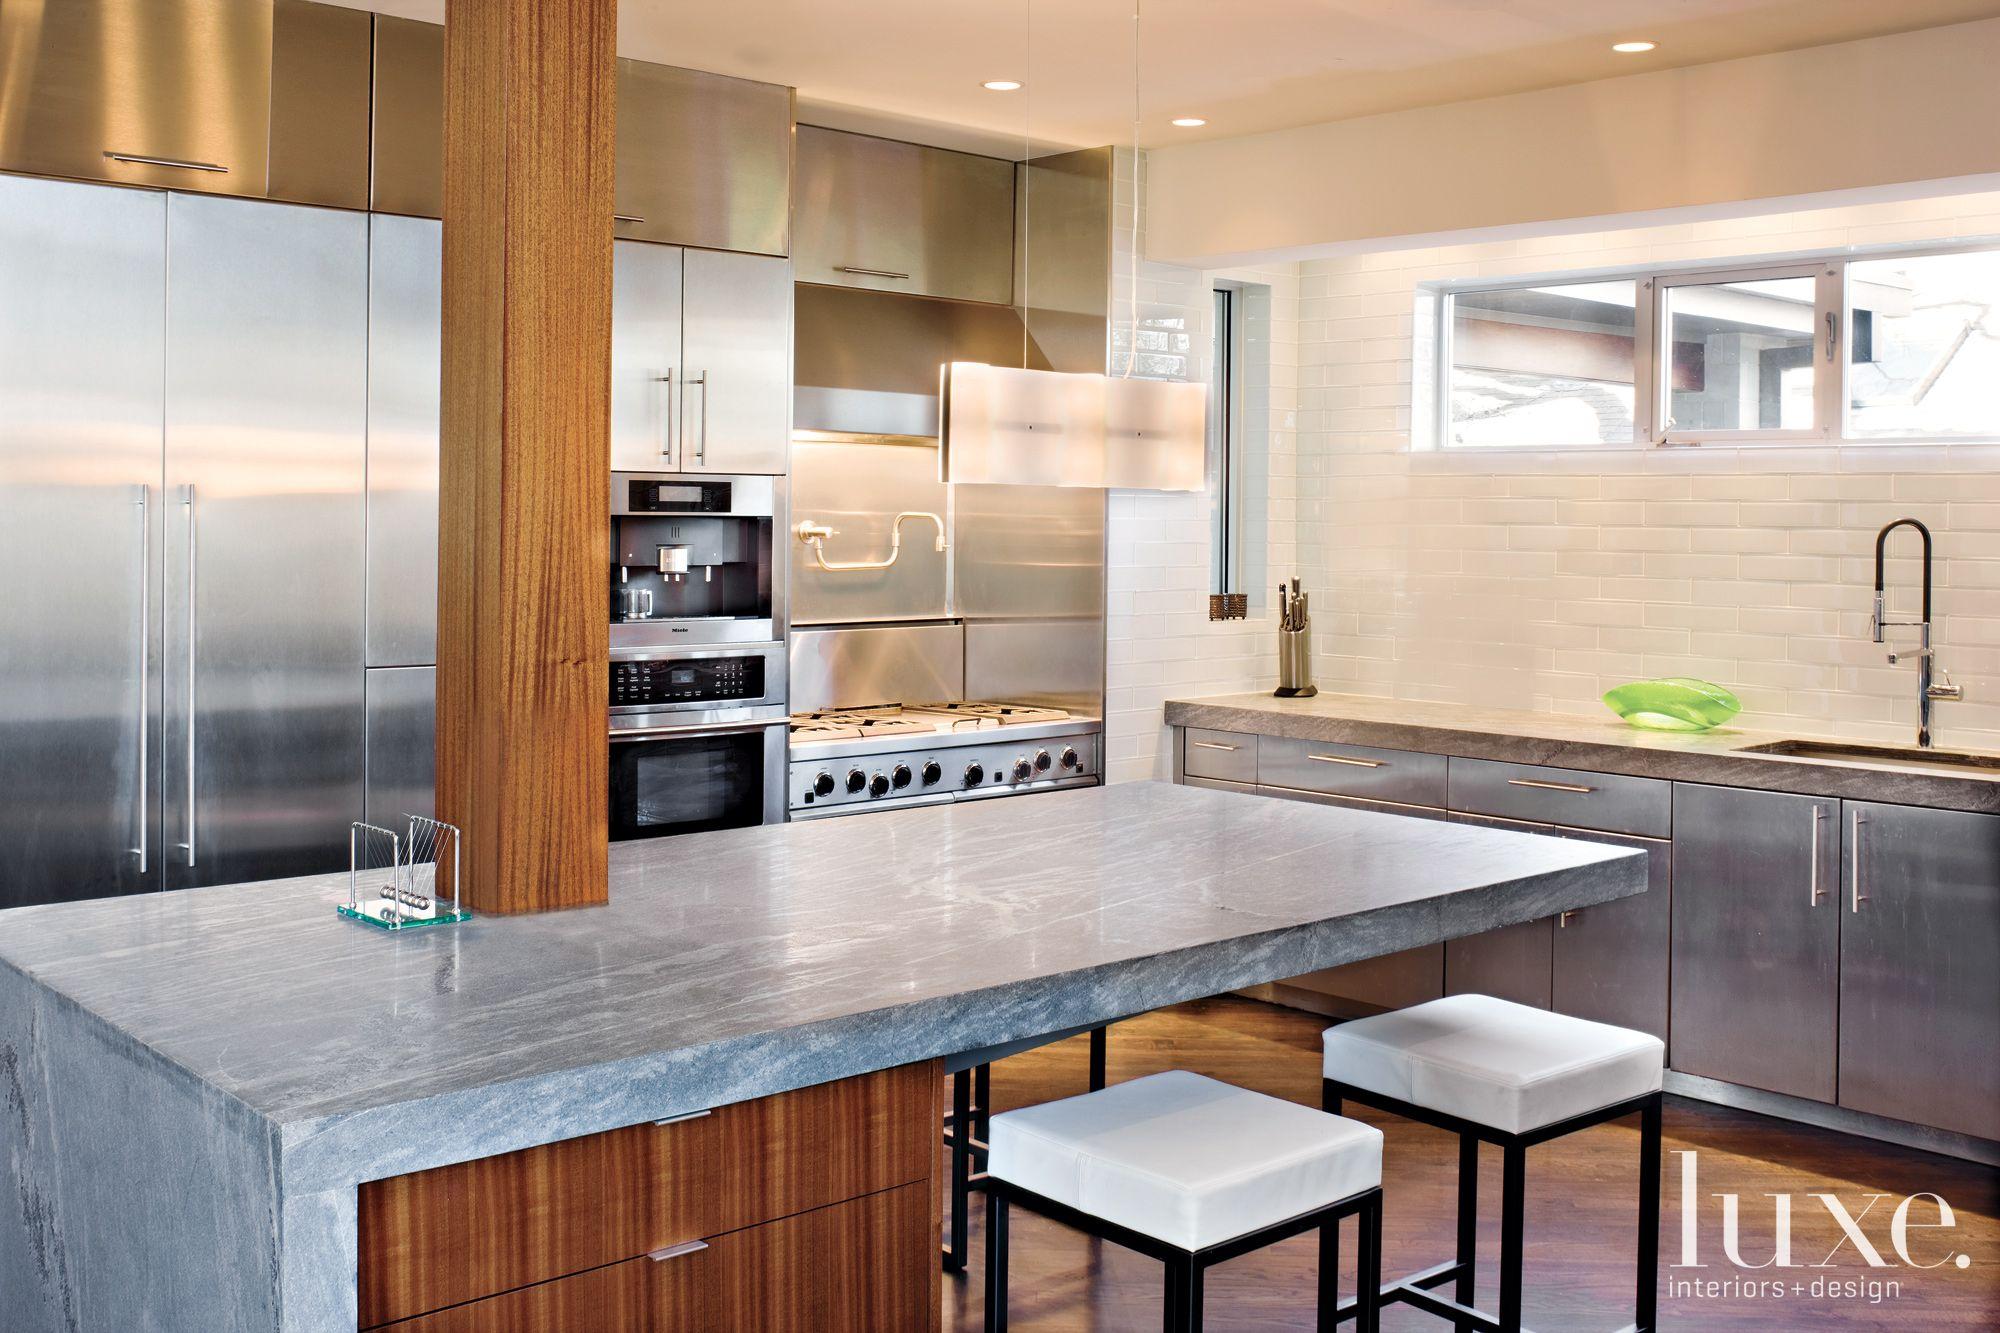 Modern Gray Kitchen with Brick Backsplash